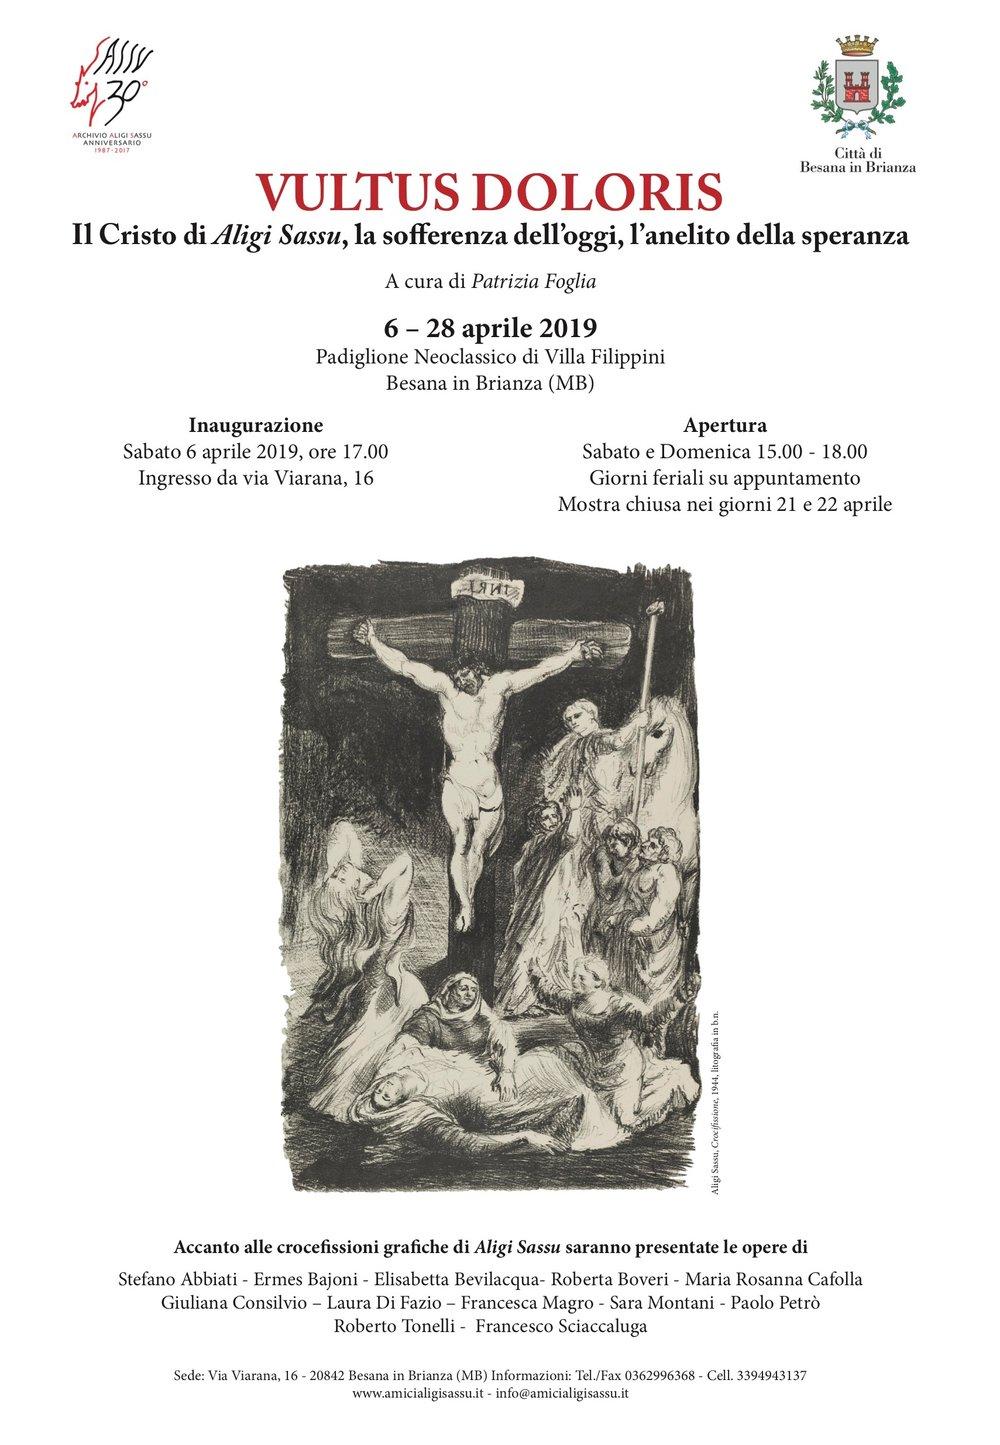 locandina+-+Vultus+Dolori+-+Aligi+Sassu+2019+%281%29.jpg